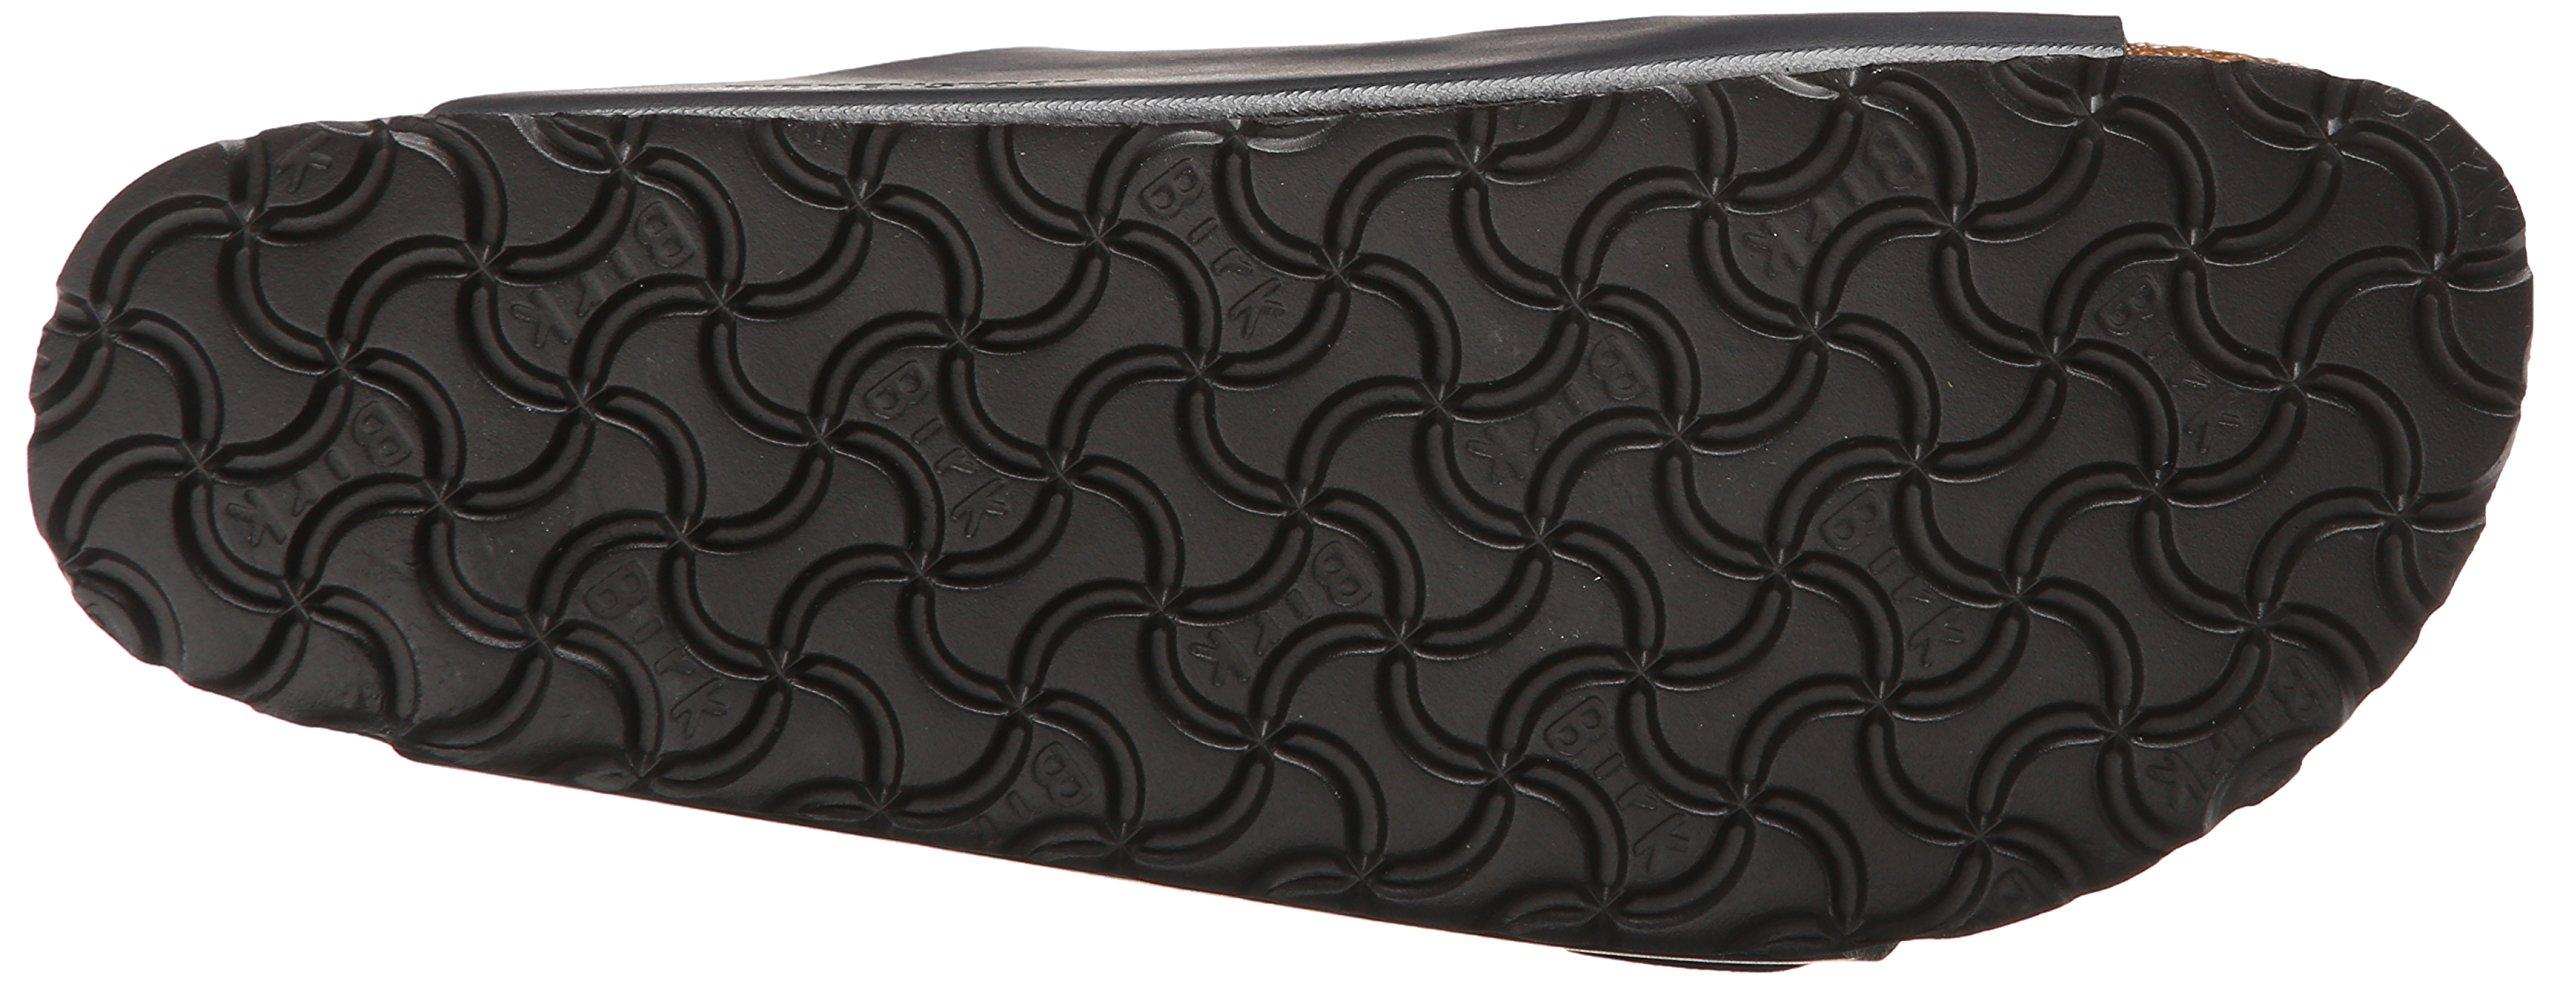 Birkenstock Unisex Arizona Hunter Black Leather Sandals - 9-9.5 2A(N) US Women/7-7.5 2A(N) US Men by Birkenstock (Image #3)